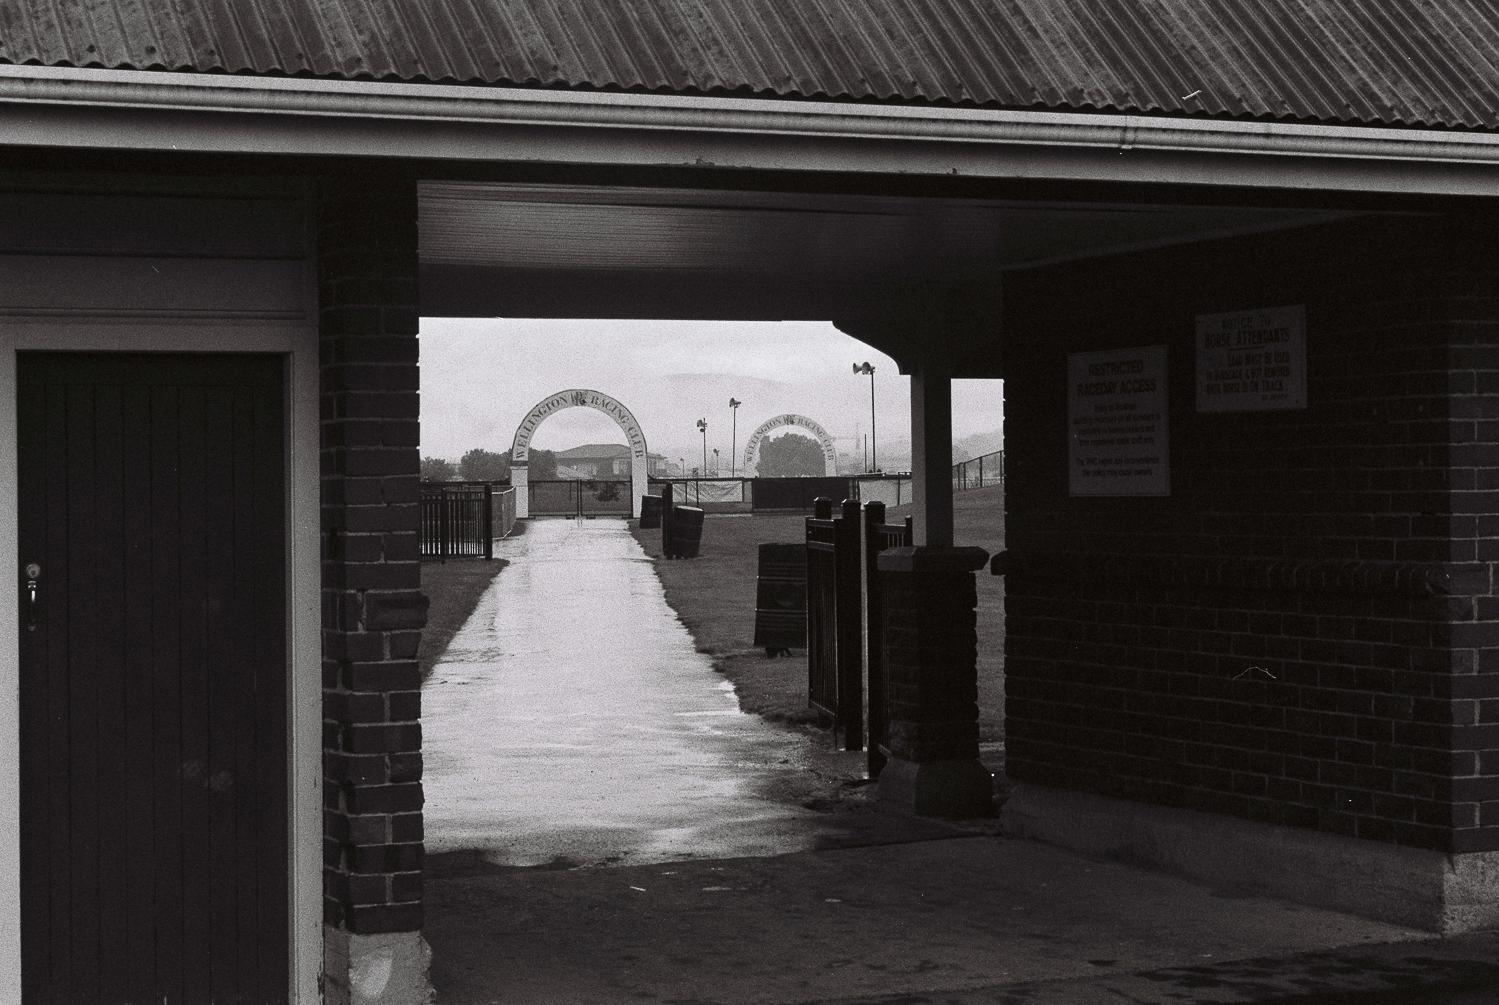 Stabling enclosure, Trentham Racecourse, October 2018